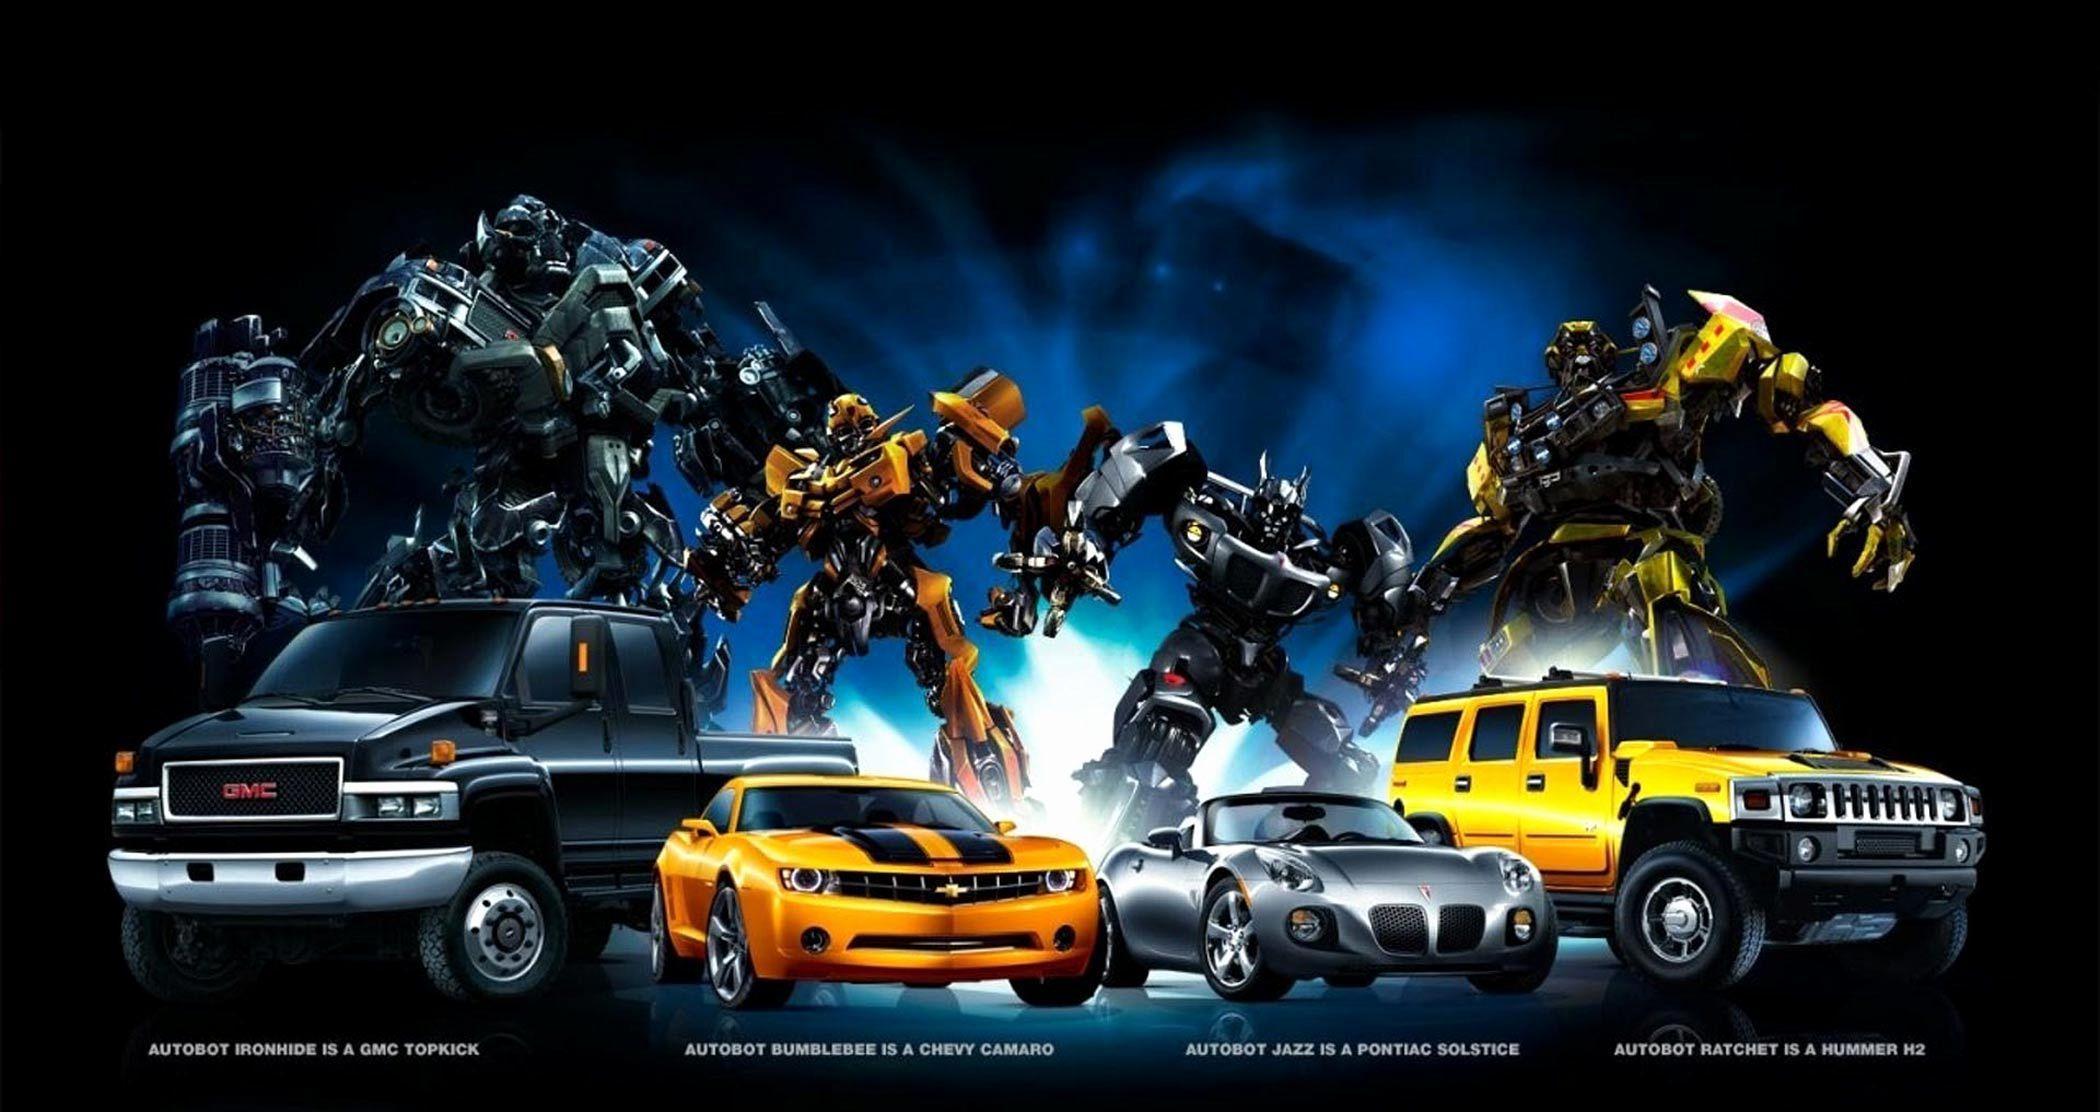 Transformer 4 Autobot Cars Wallpapers Hd Wallpaper Cave